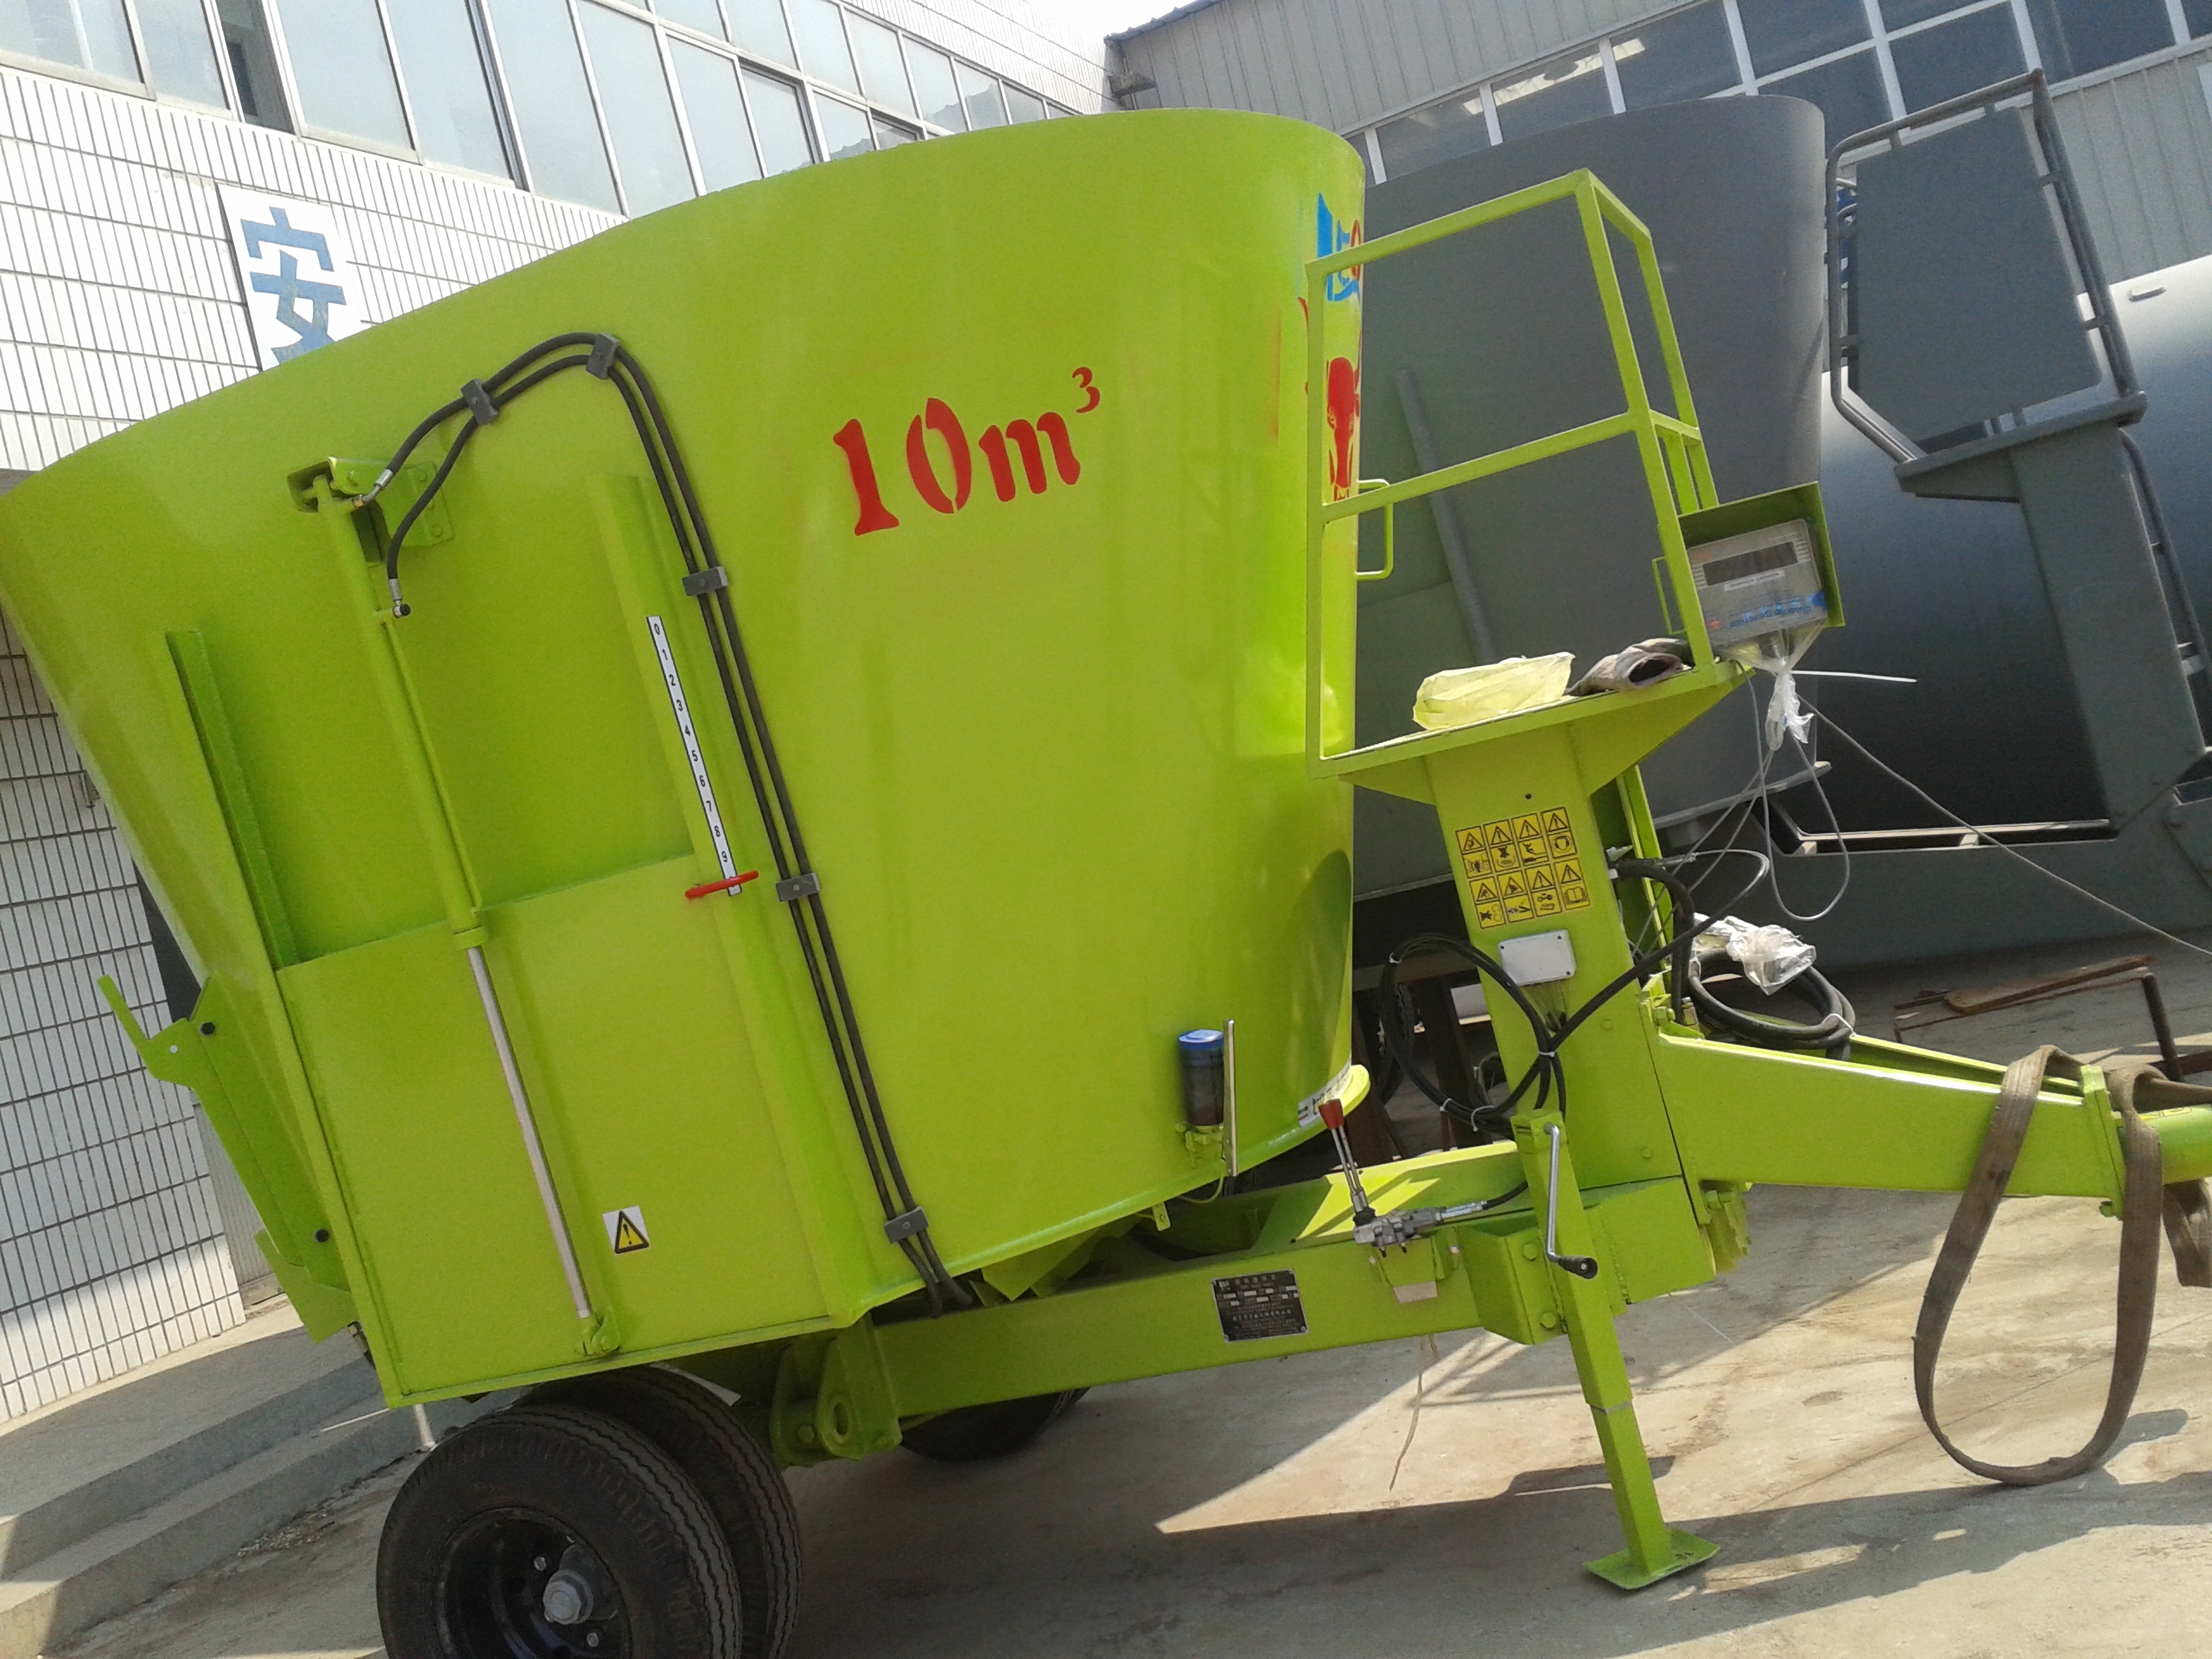 China Feed Mixer Machine,Vertical Tmr Feeding Mixer,Vertical Feeding